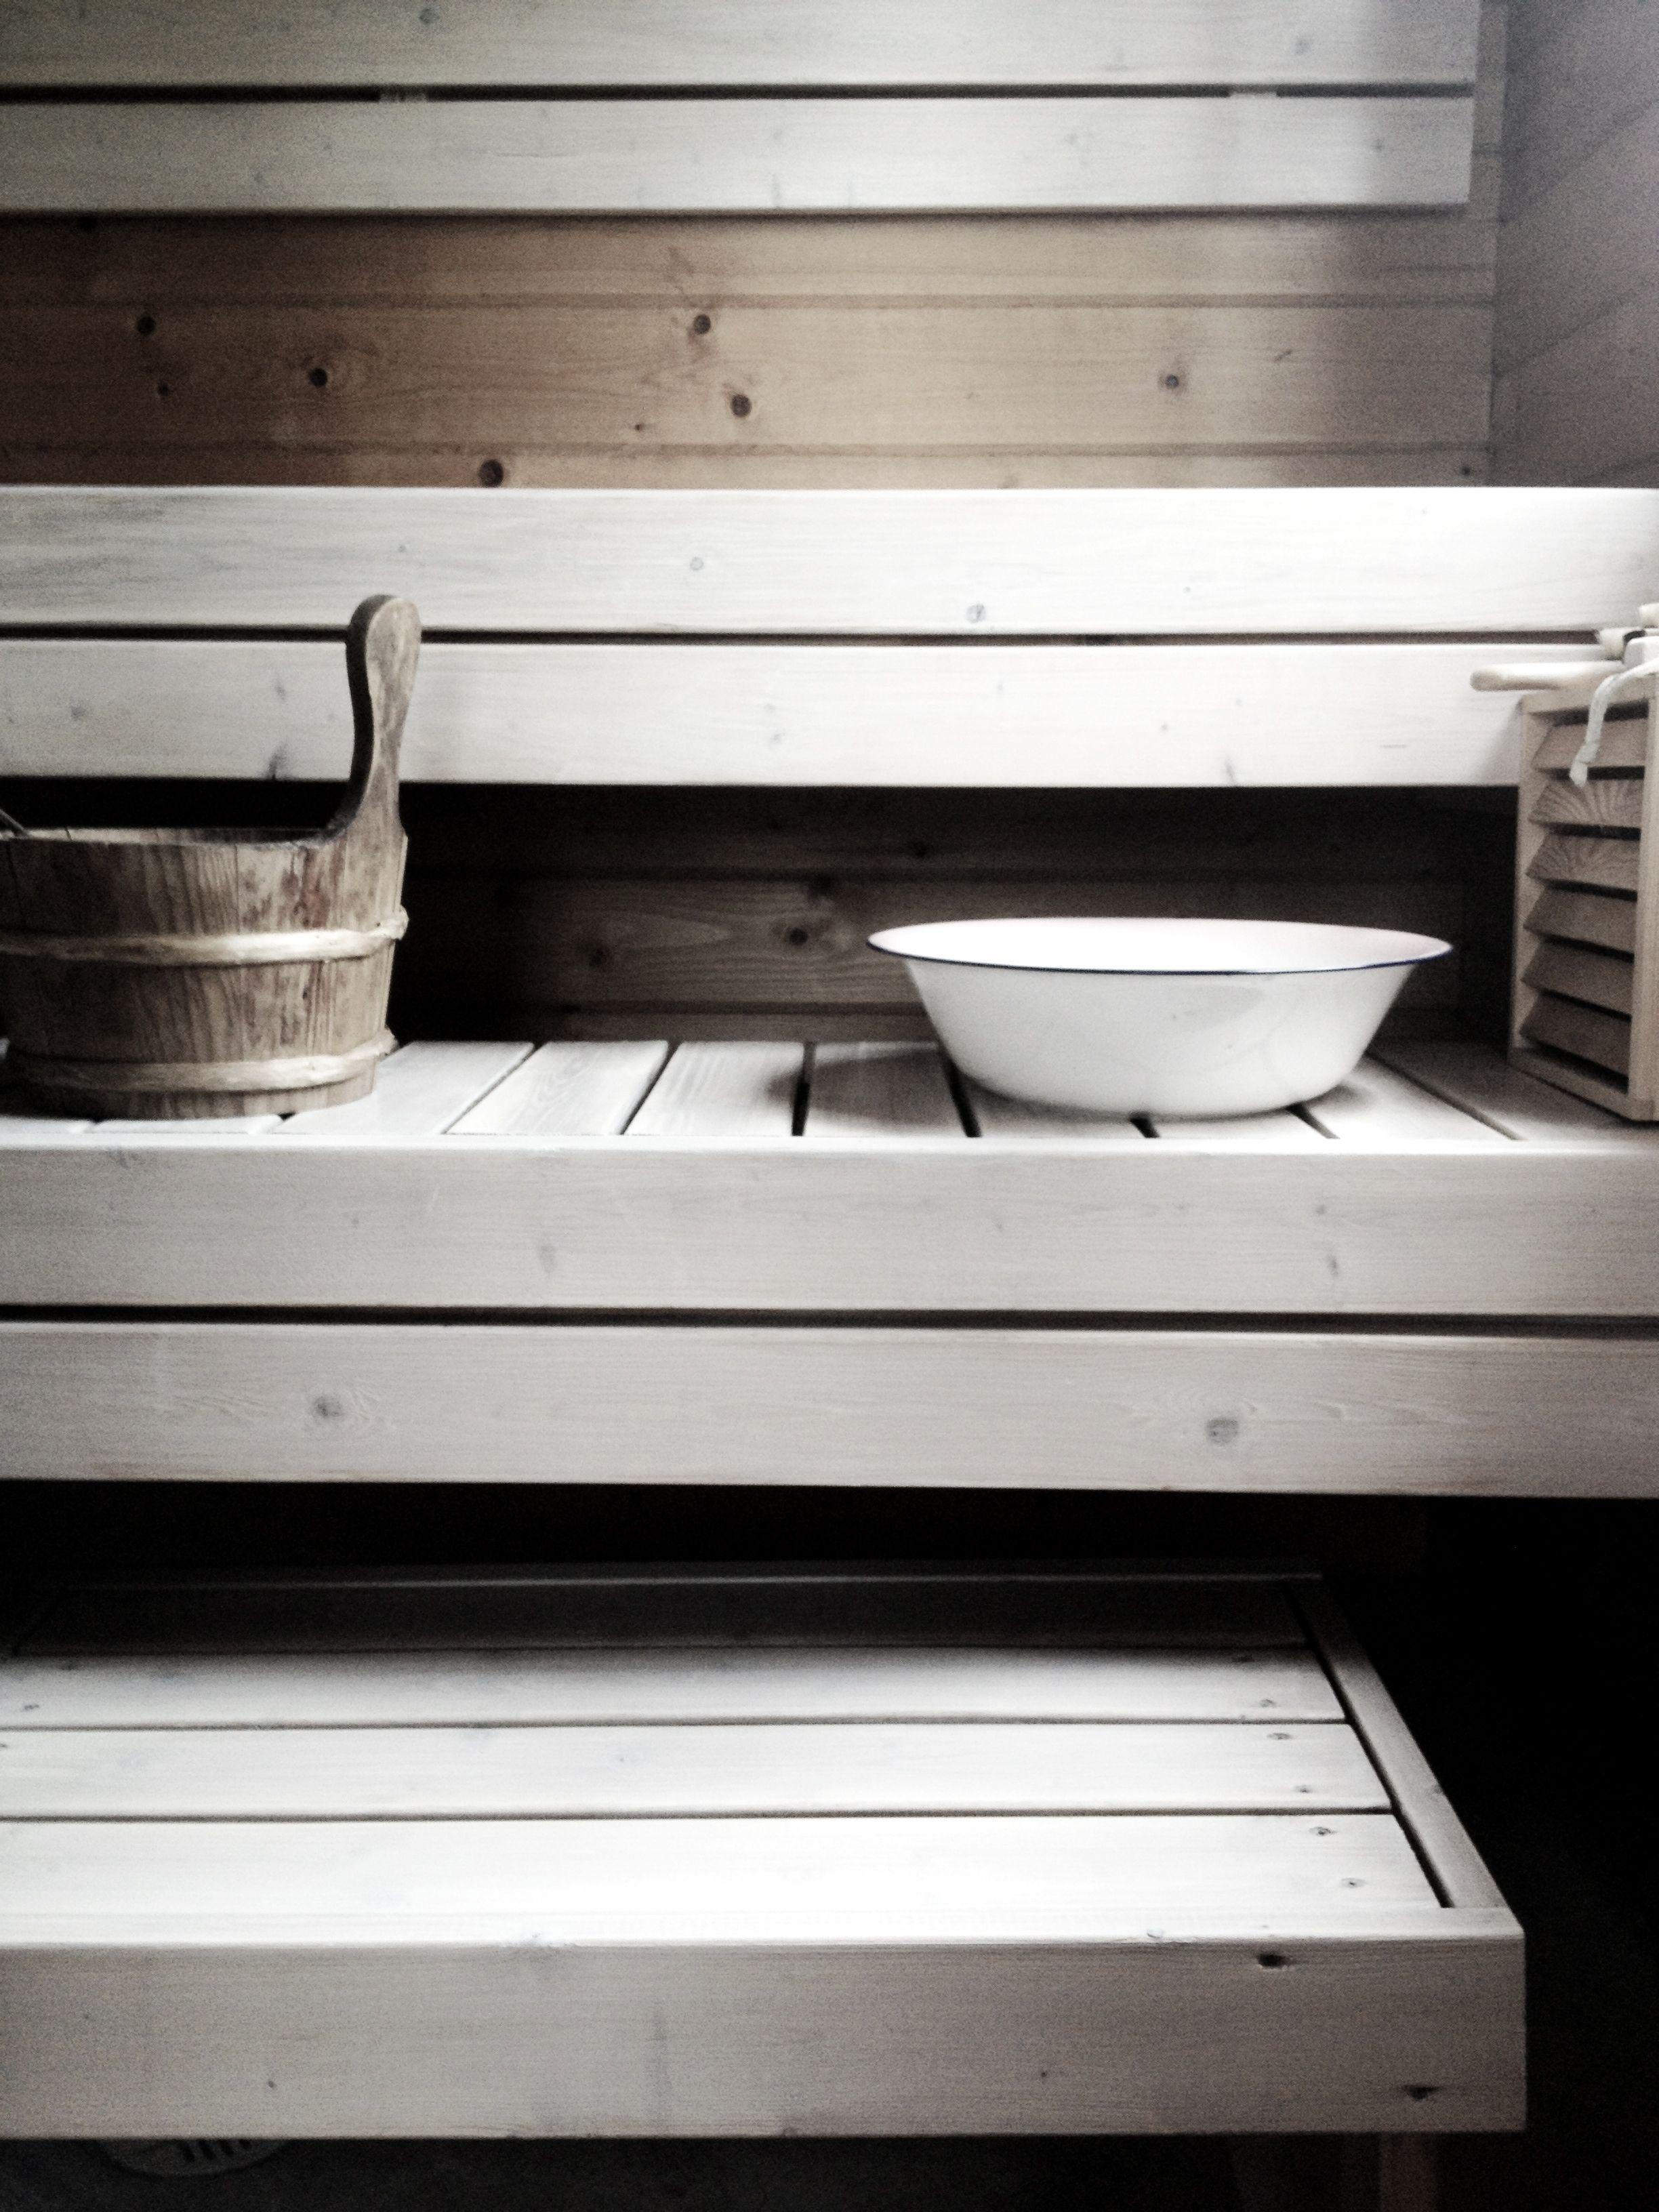 valkoiset lauteet raikastavat saunan lepola living pinterest sdb. Black Bedroom Furniture Sets. Home Design Ideas